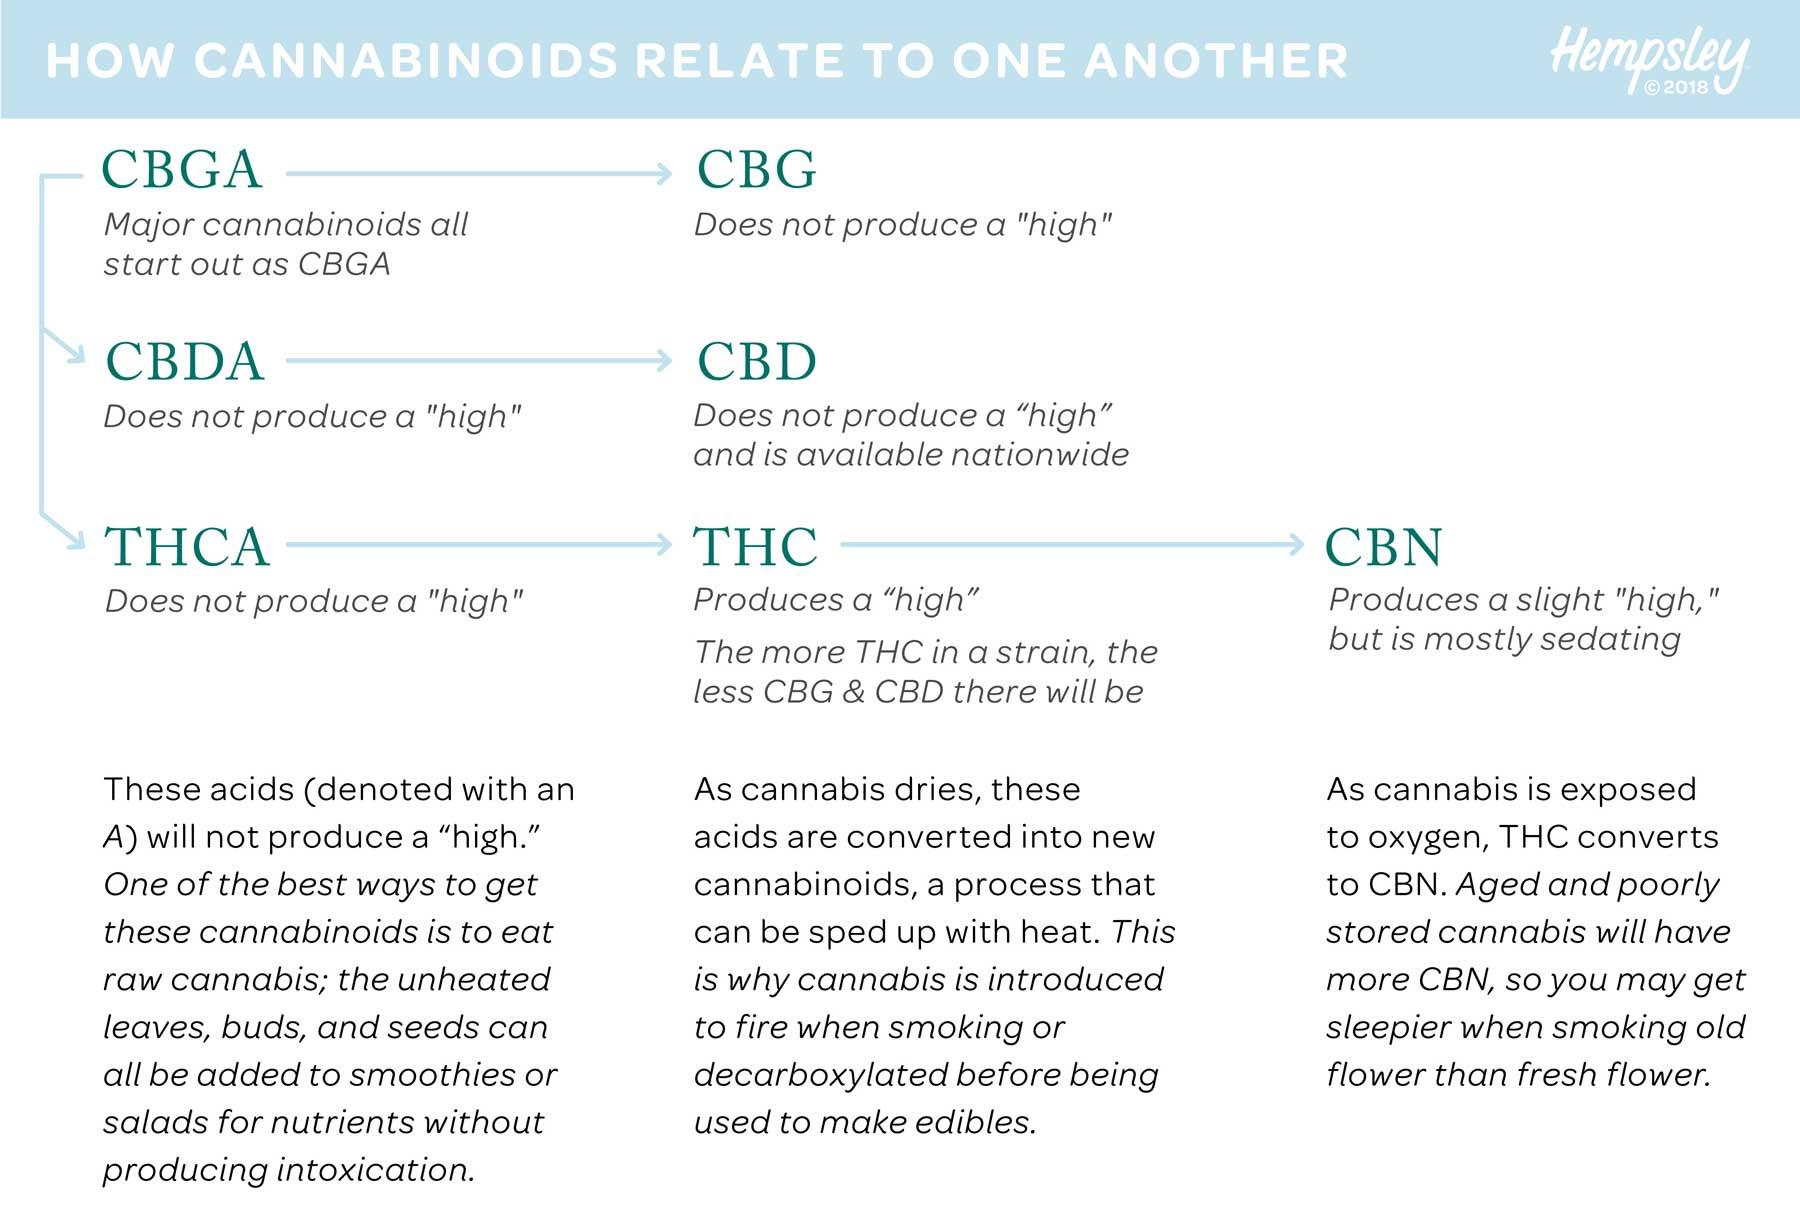 cannabinoids-chain-graphic-hempsley-MAR2018-1800PX.jpg